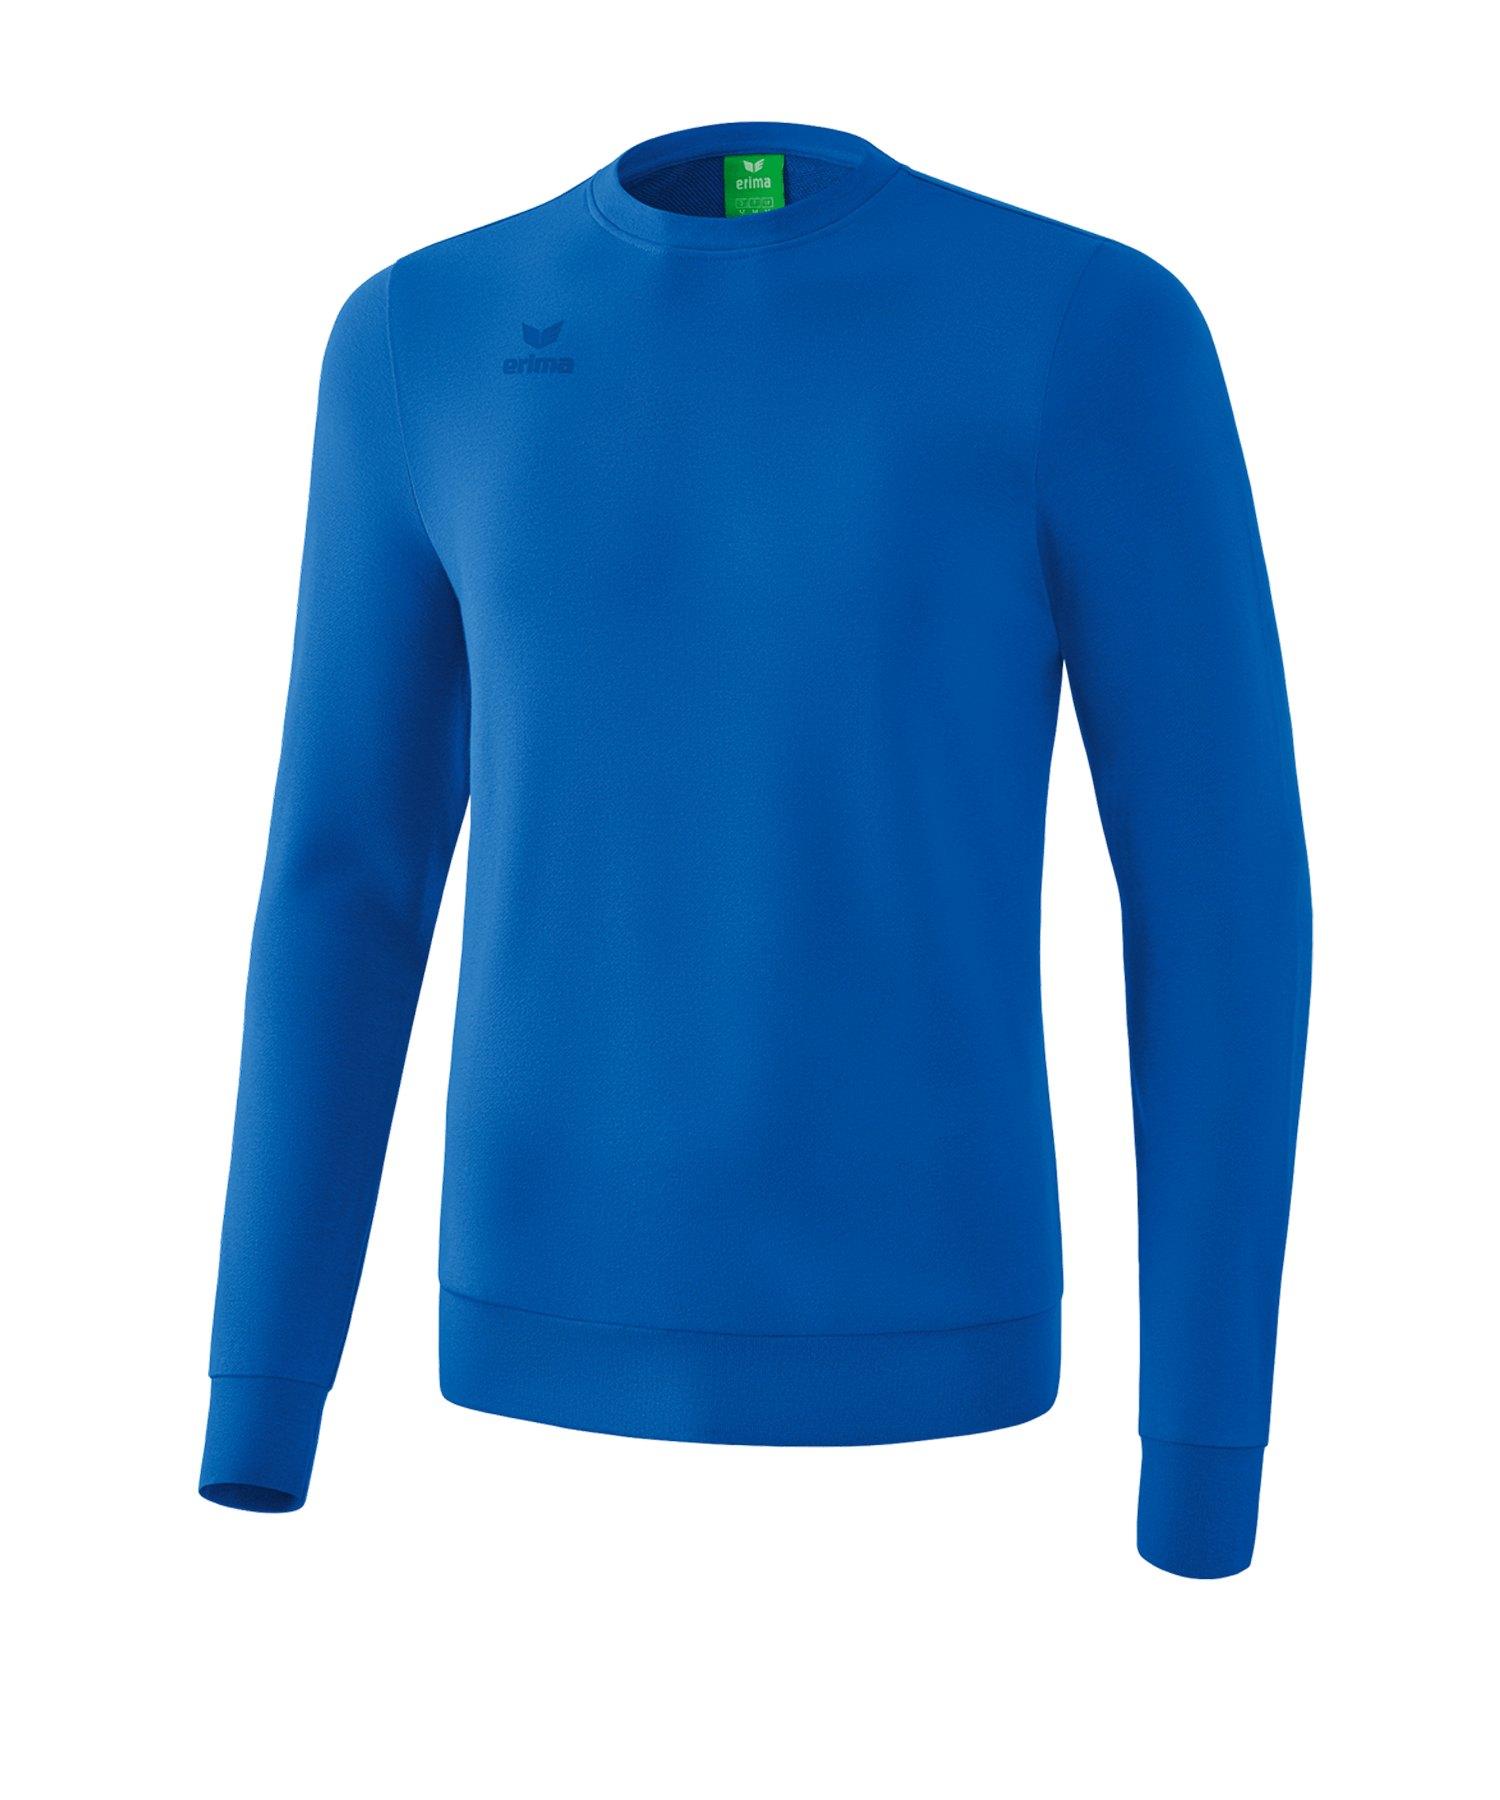 Erima Basic Sweatshirt Blau - blau